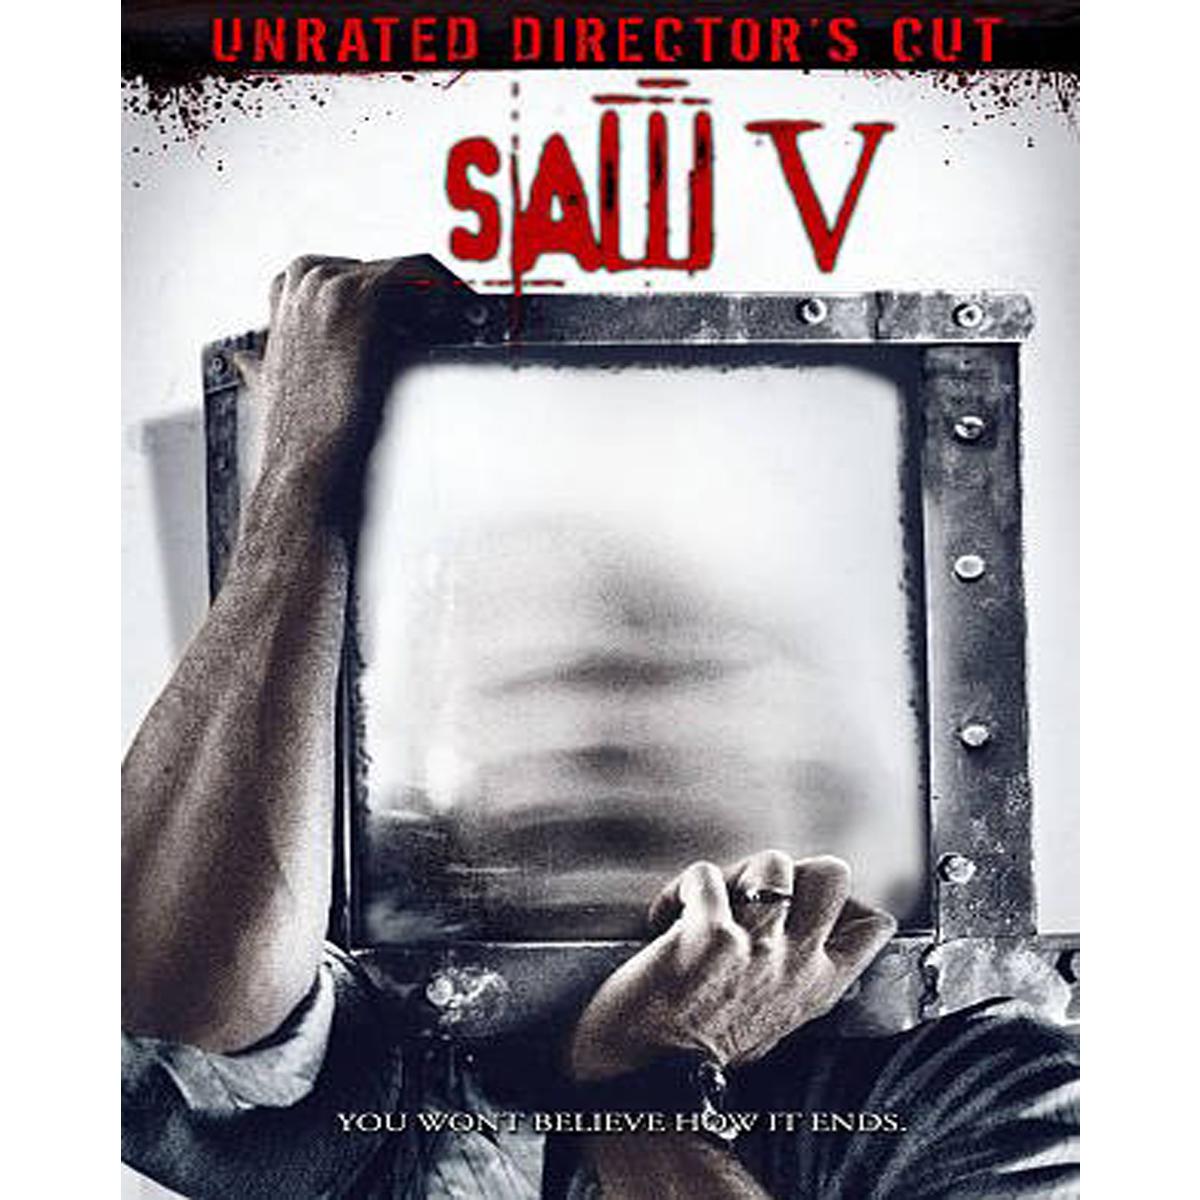 Saw 5 DVD